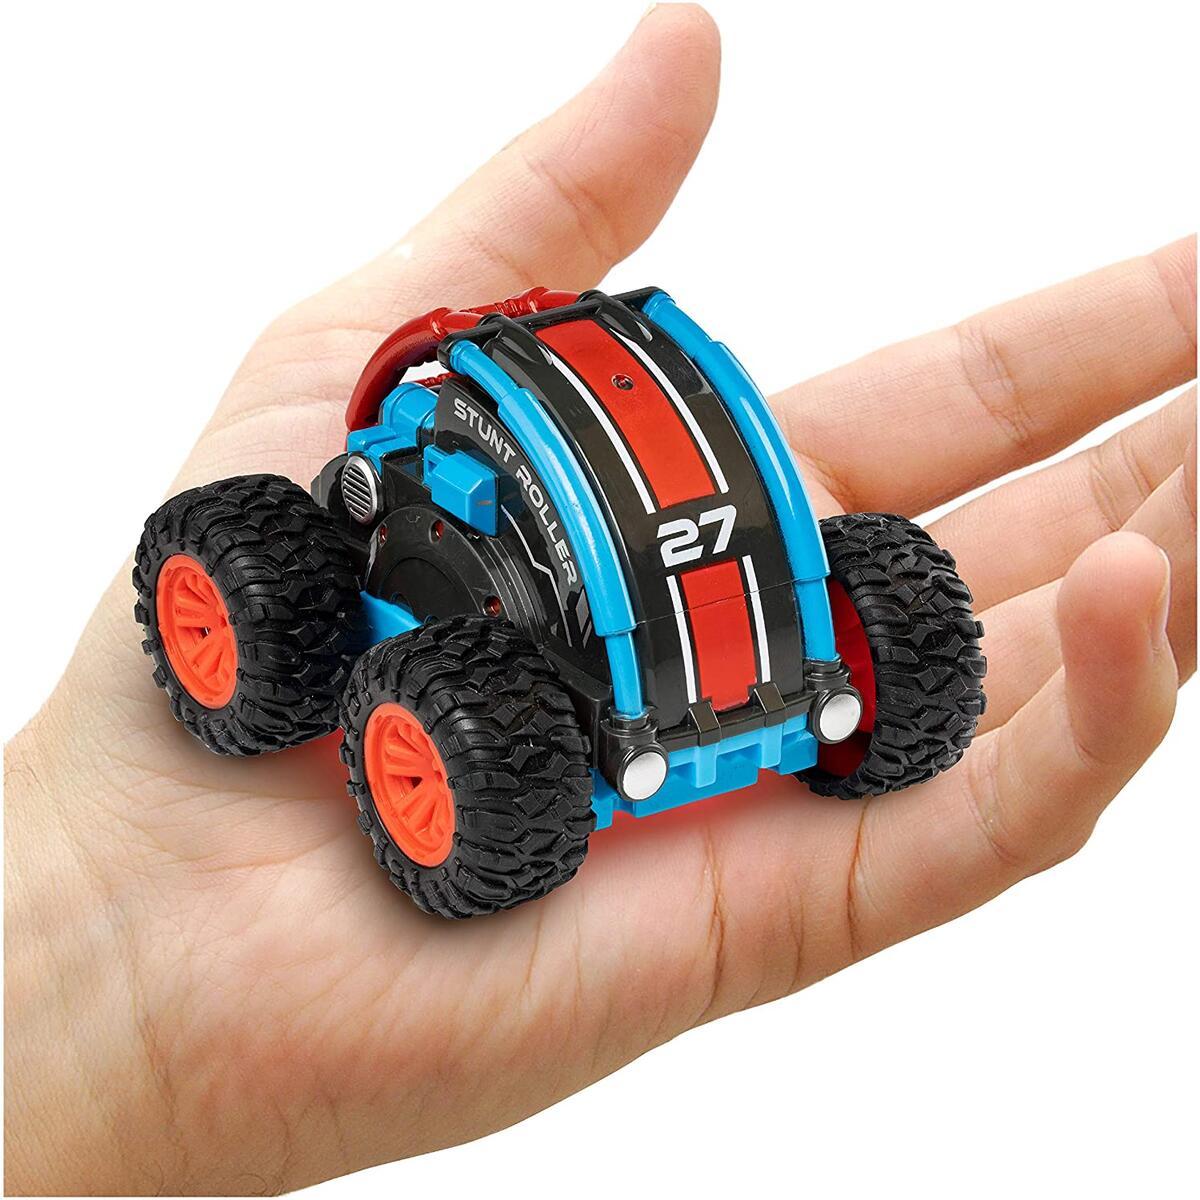 Stunt Roller-RED/BLUE Remote Control Car for Kids